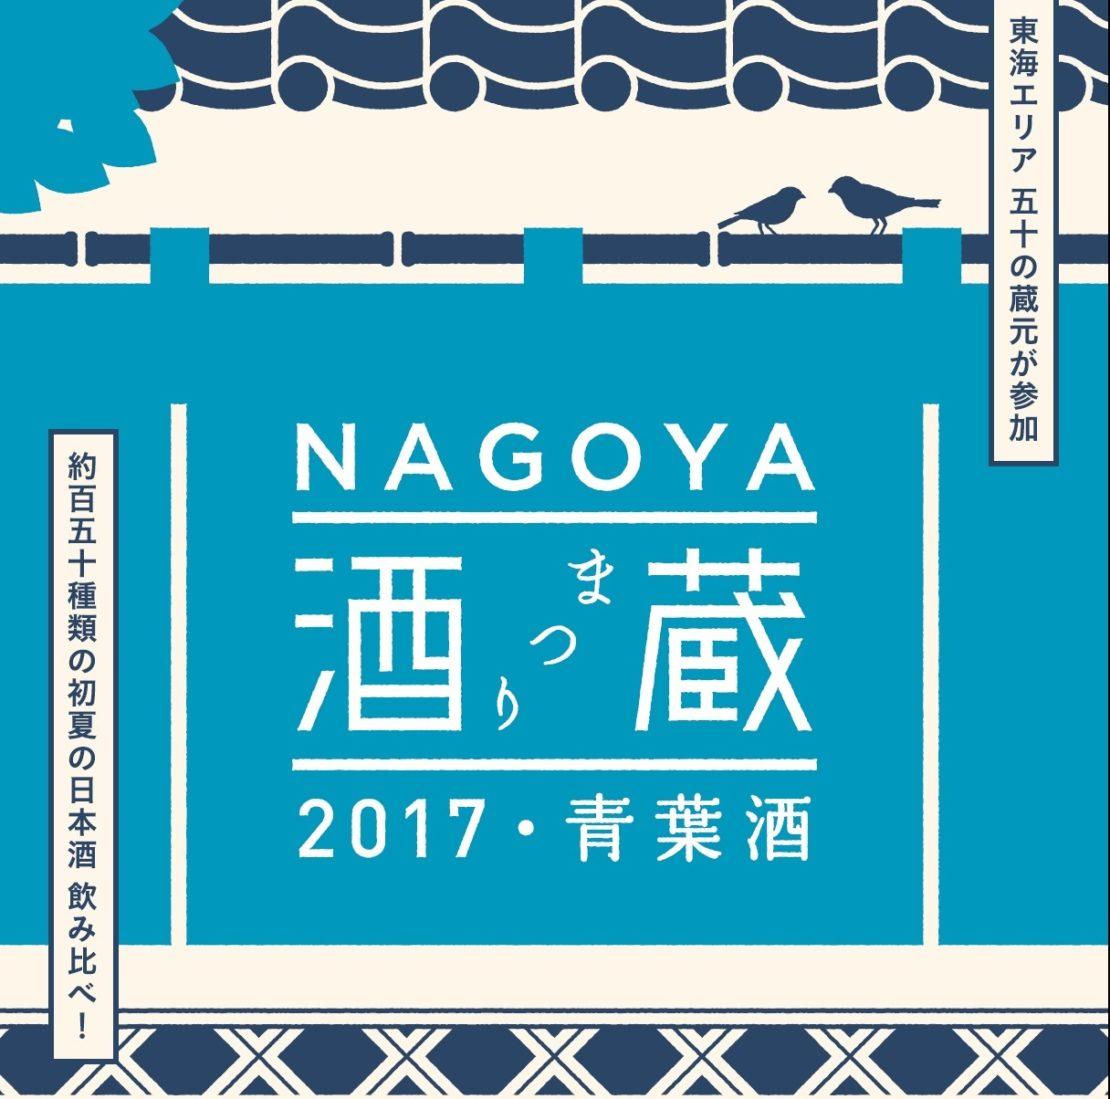 「NAGOYA 酒造まつり‐2017・青葉酒‐」で日本酒の魅力を楽しもう!